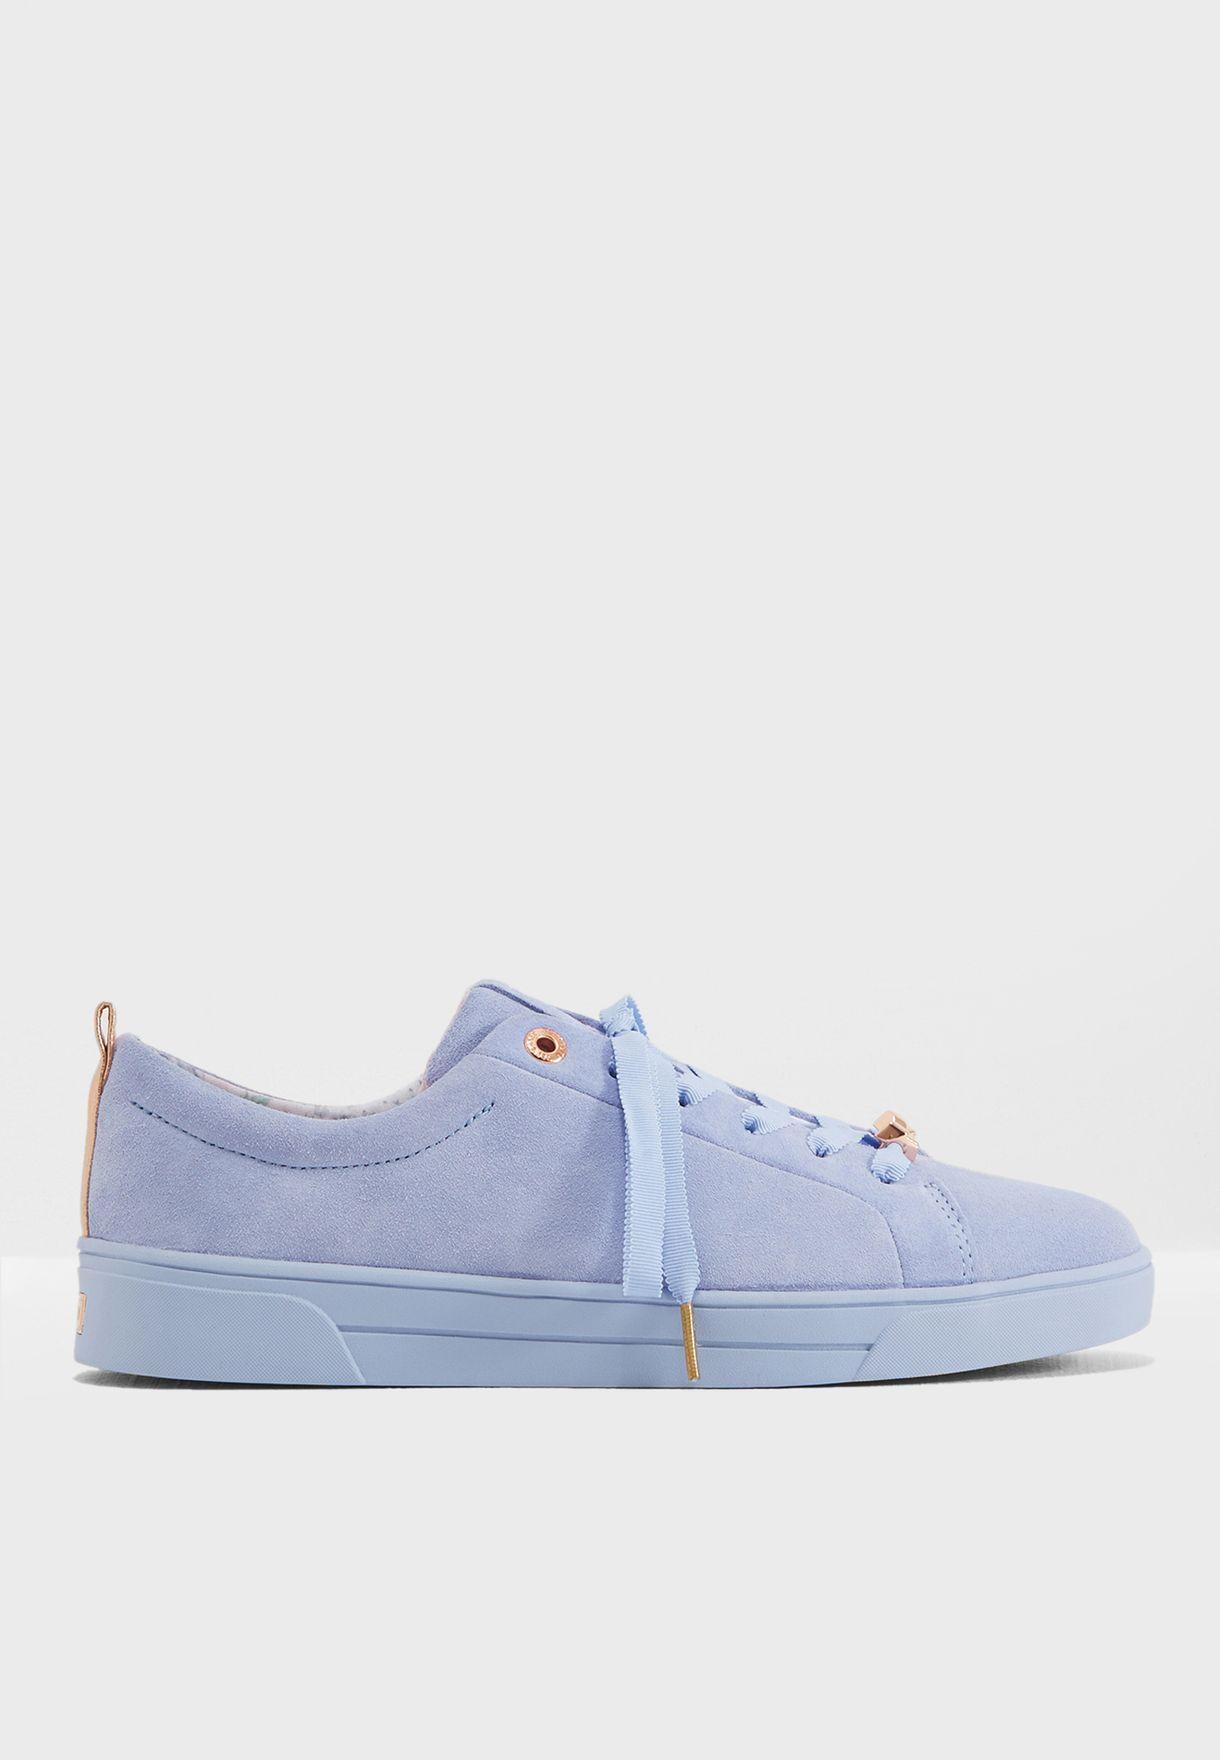 46c9c703bc7f5e Shop Ted baker blue Kelleis Casual Sneaker 917198 for Women in UAE ...